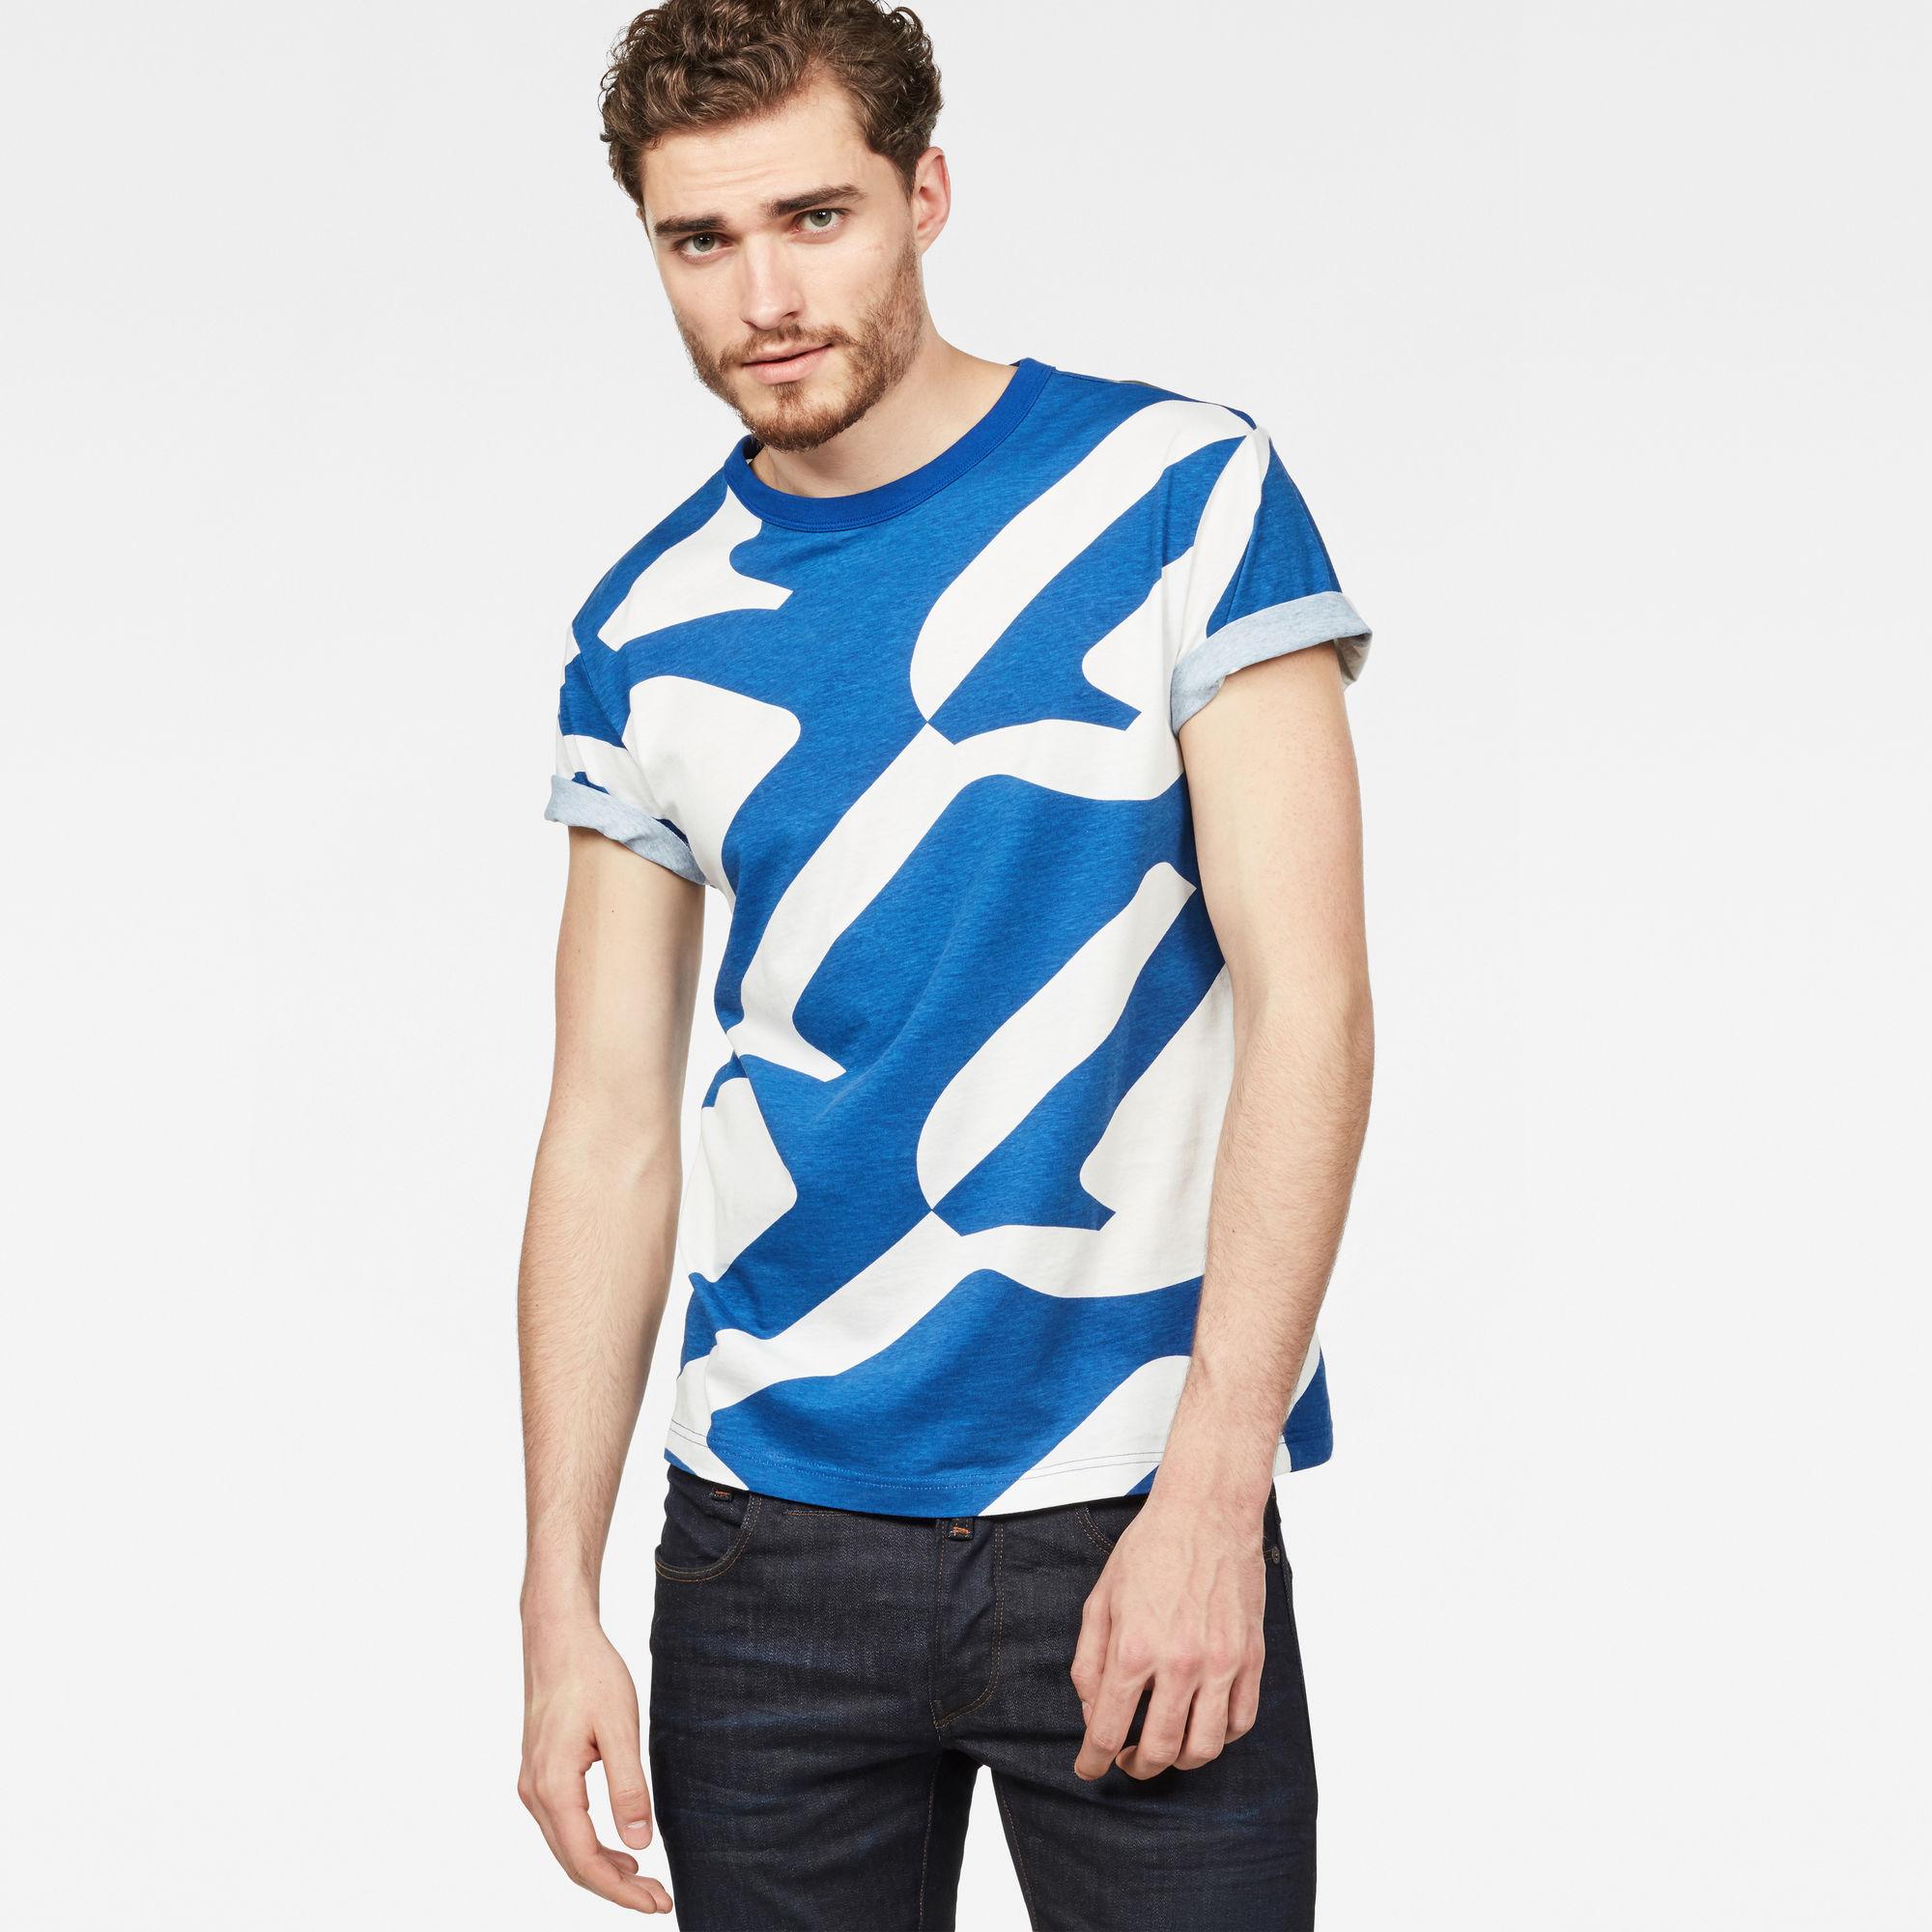 Image of G Star Raw Hyce Regular Pattern T-Shirt